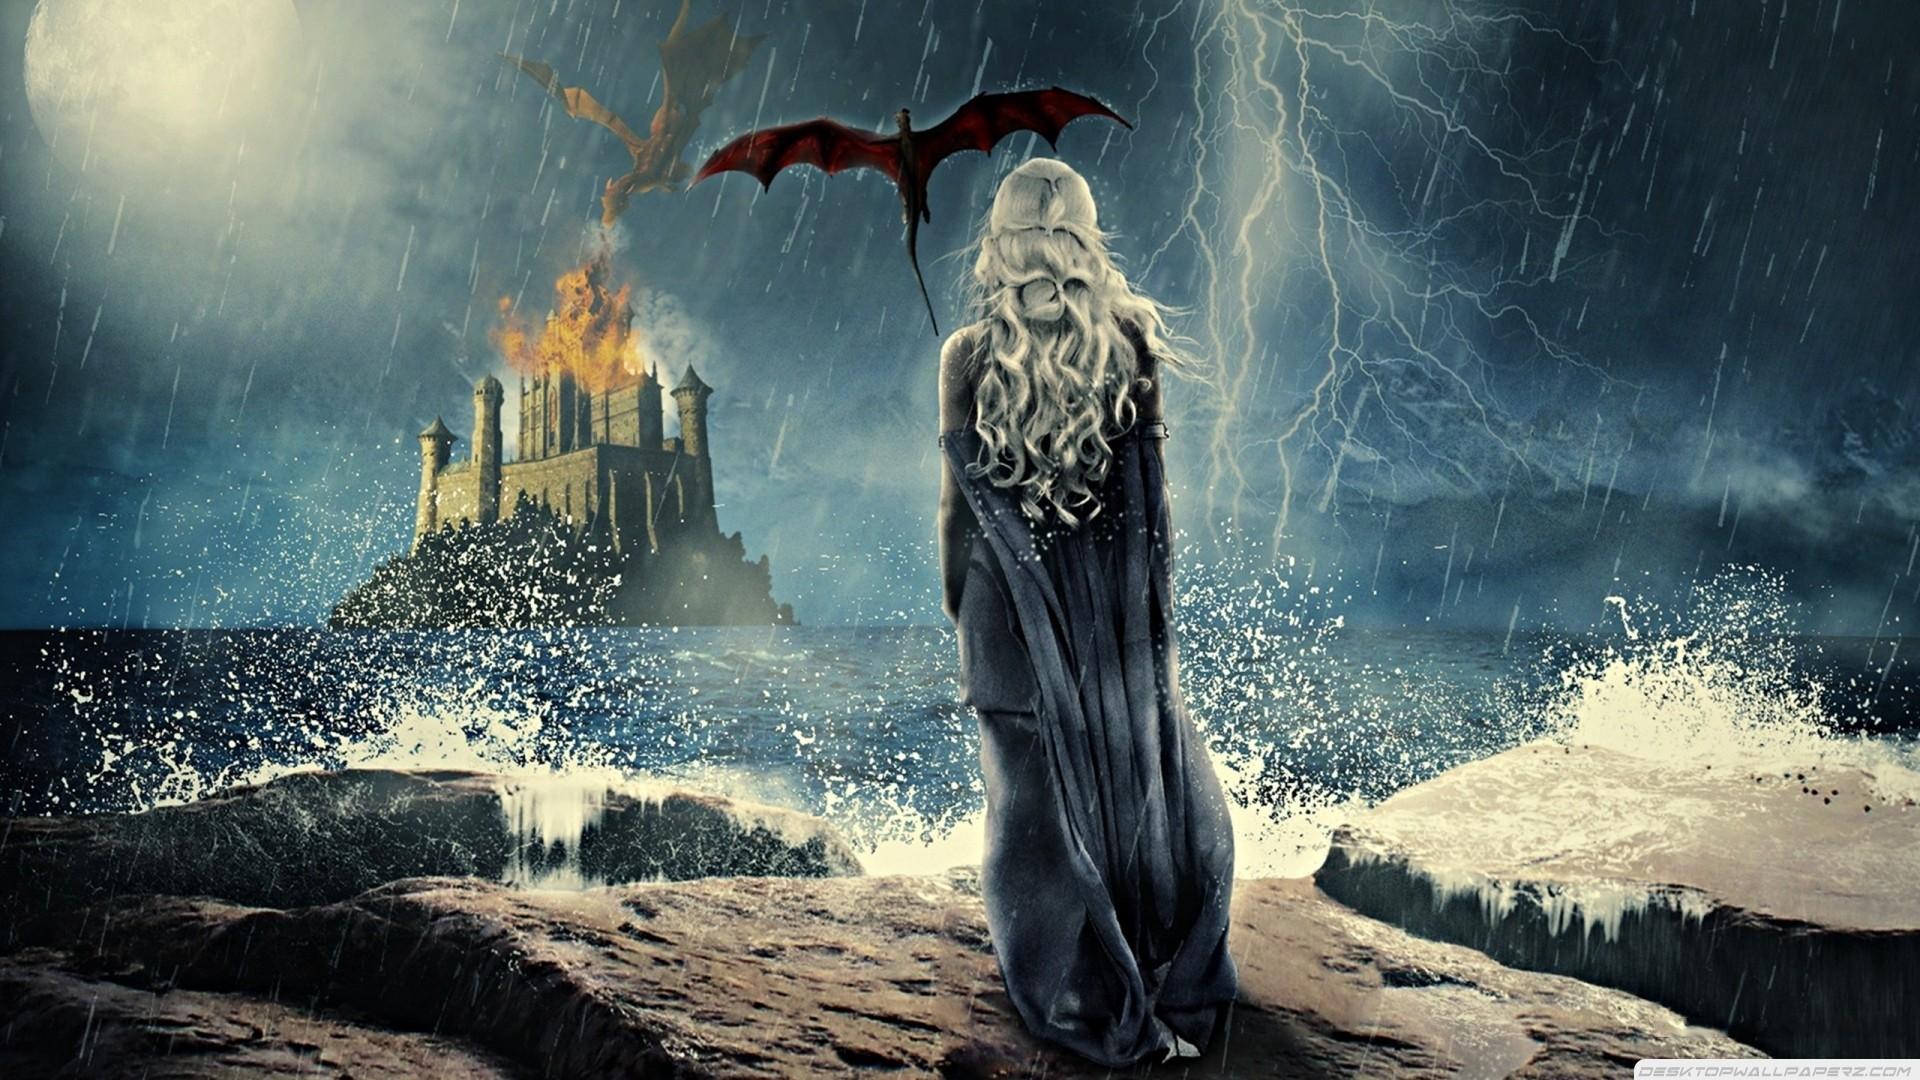 Game Of Thrones Season 6 Wallpaper 05277